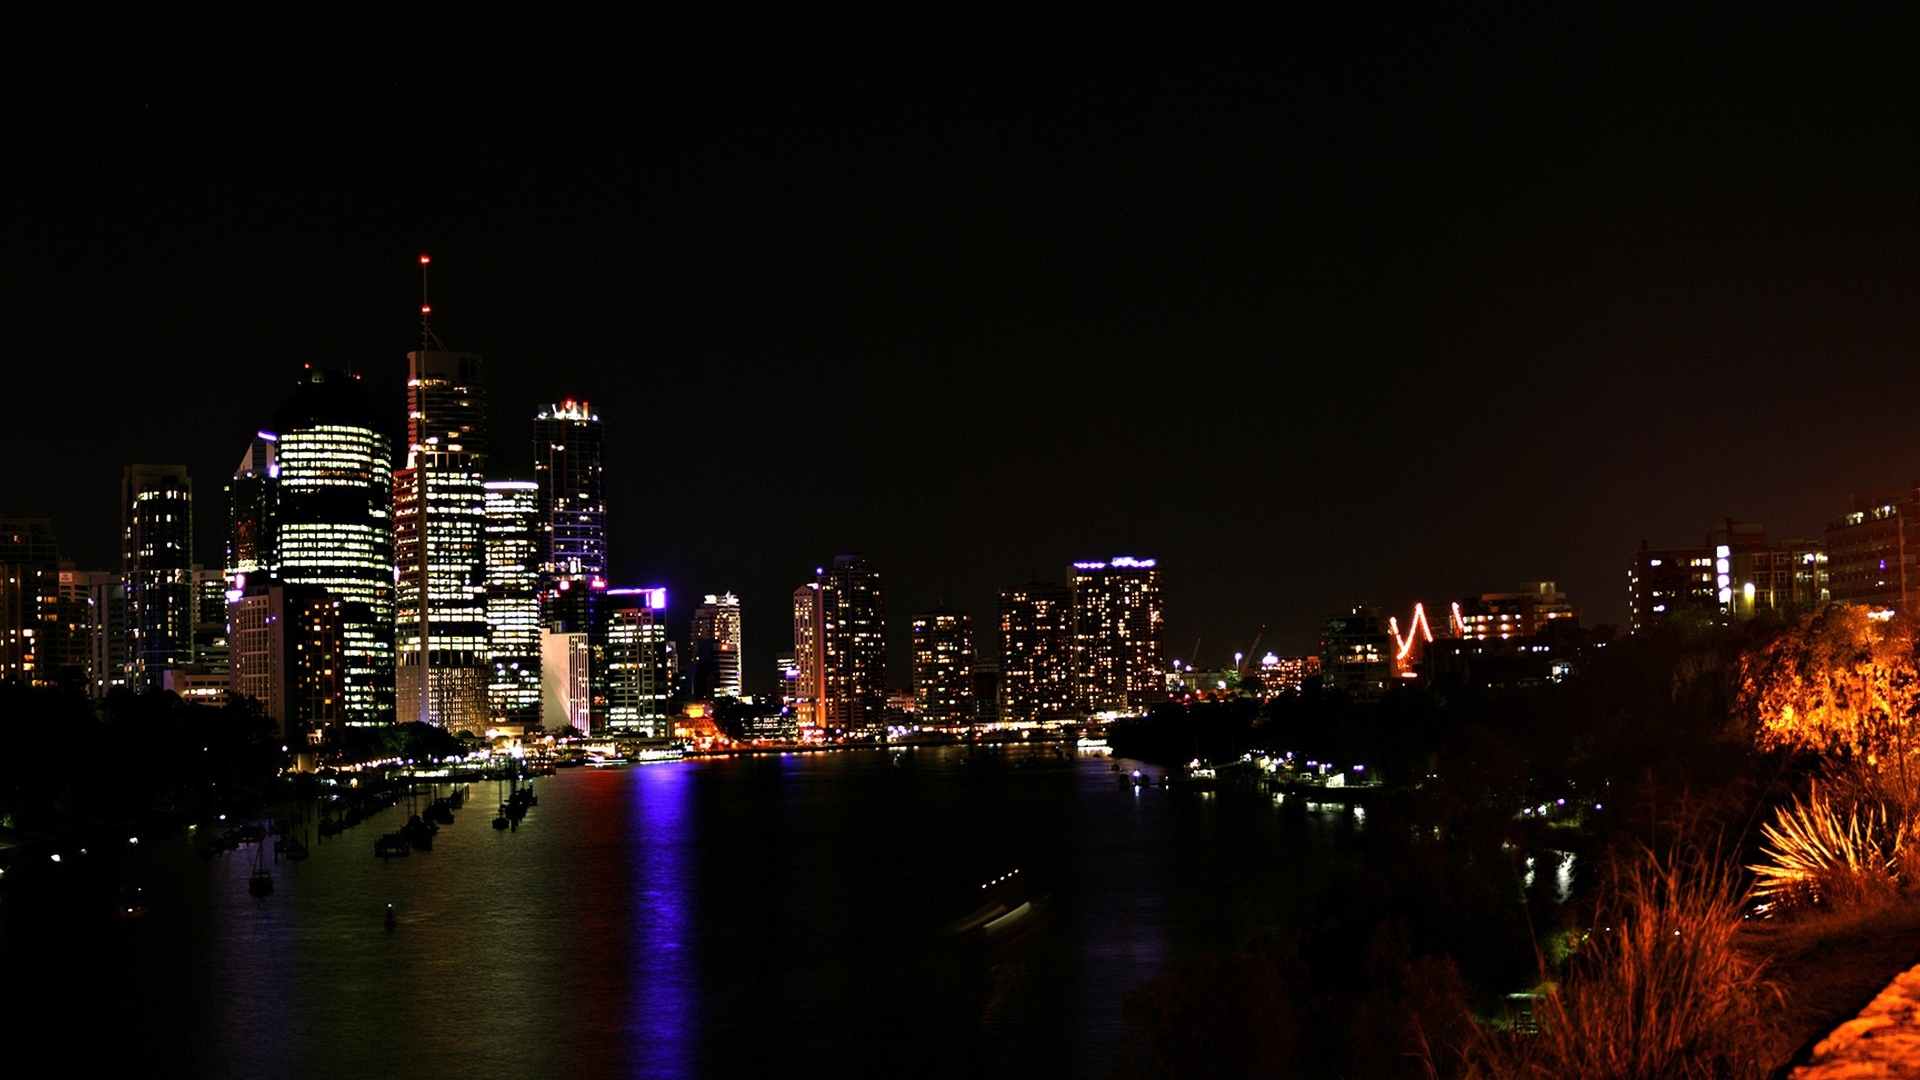 Download Wallpaper 1920x1080 Chicago Night Lights City Skyline